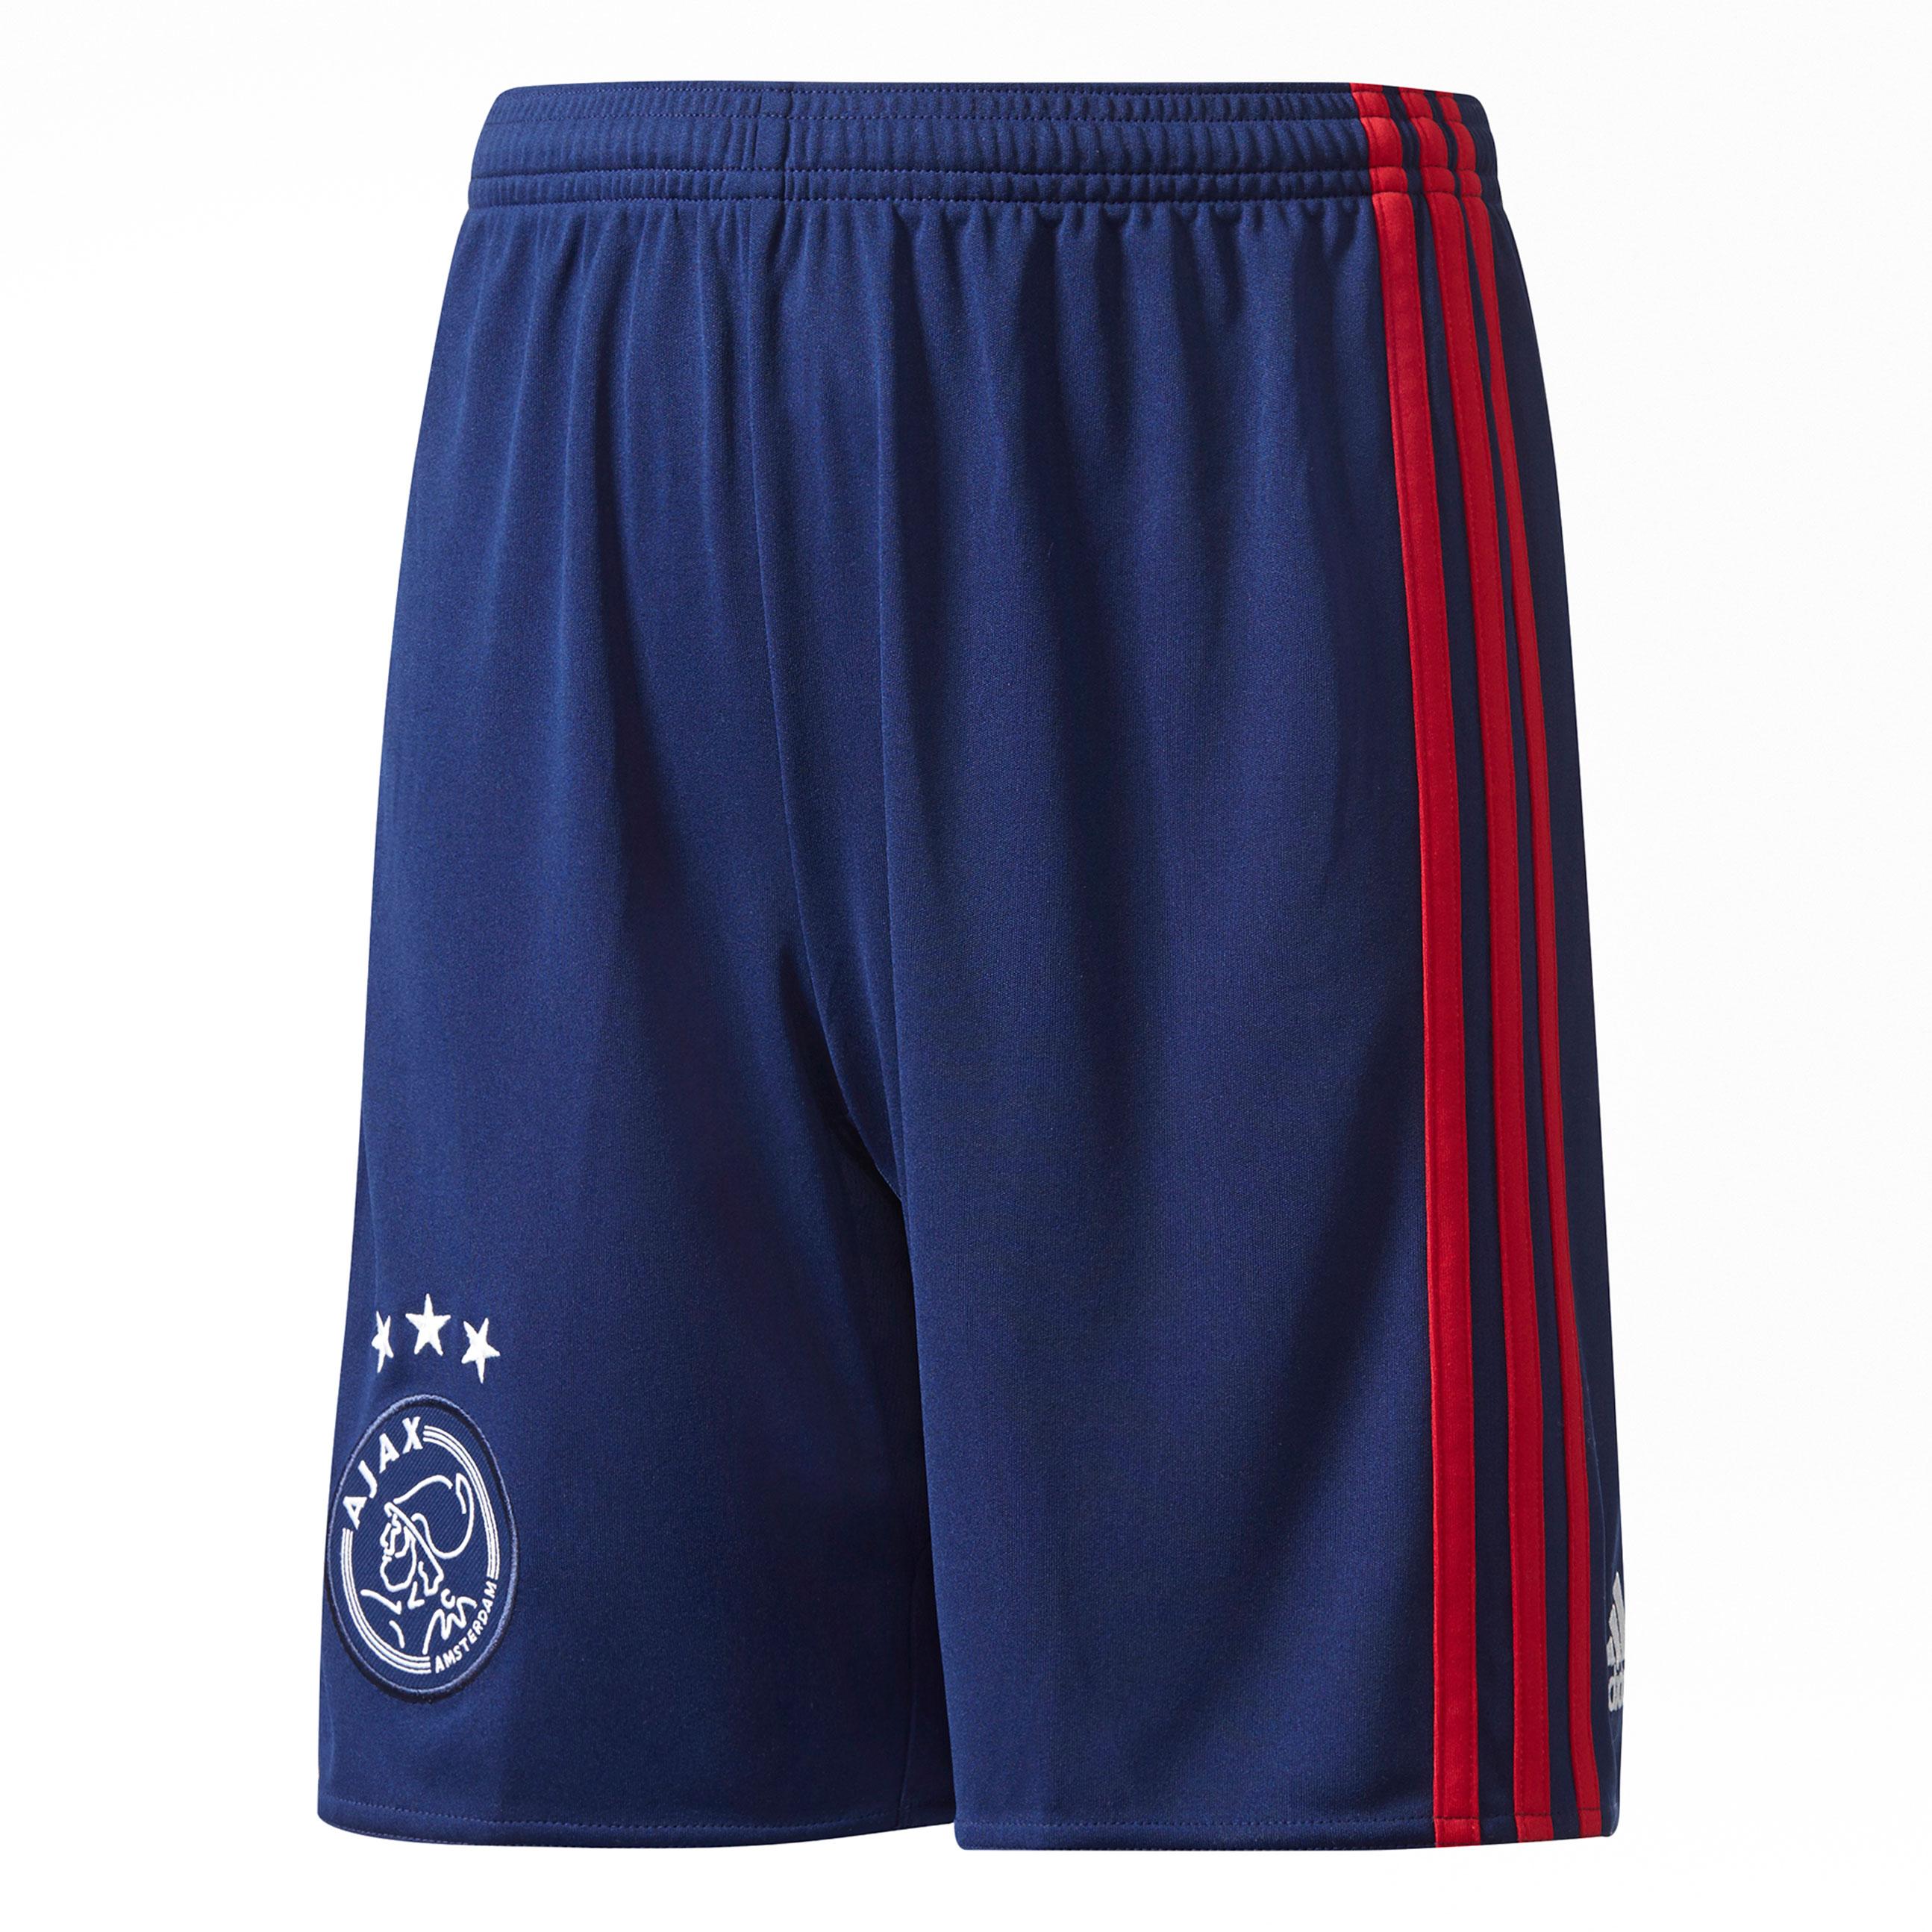 Adidas Ajax Amsterdam kraťasy detské (2017-2018) 0181b7ec766